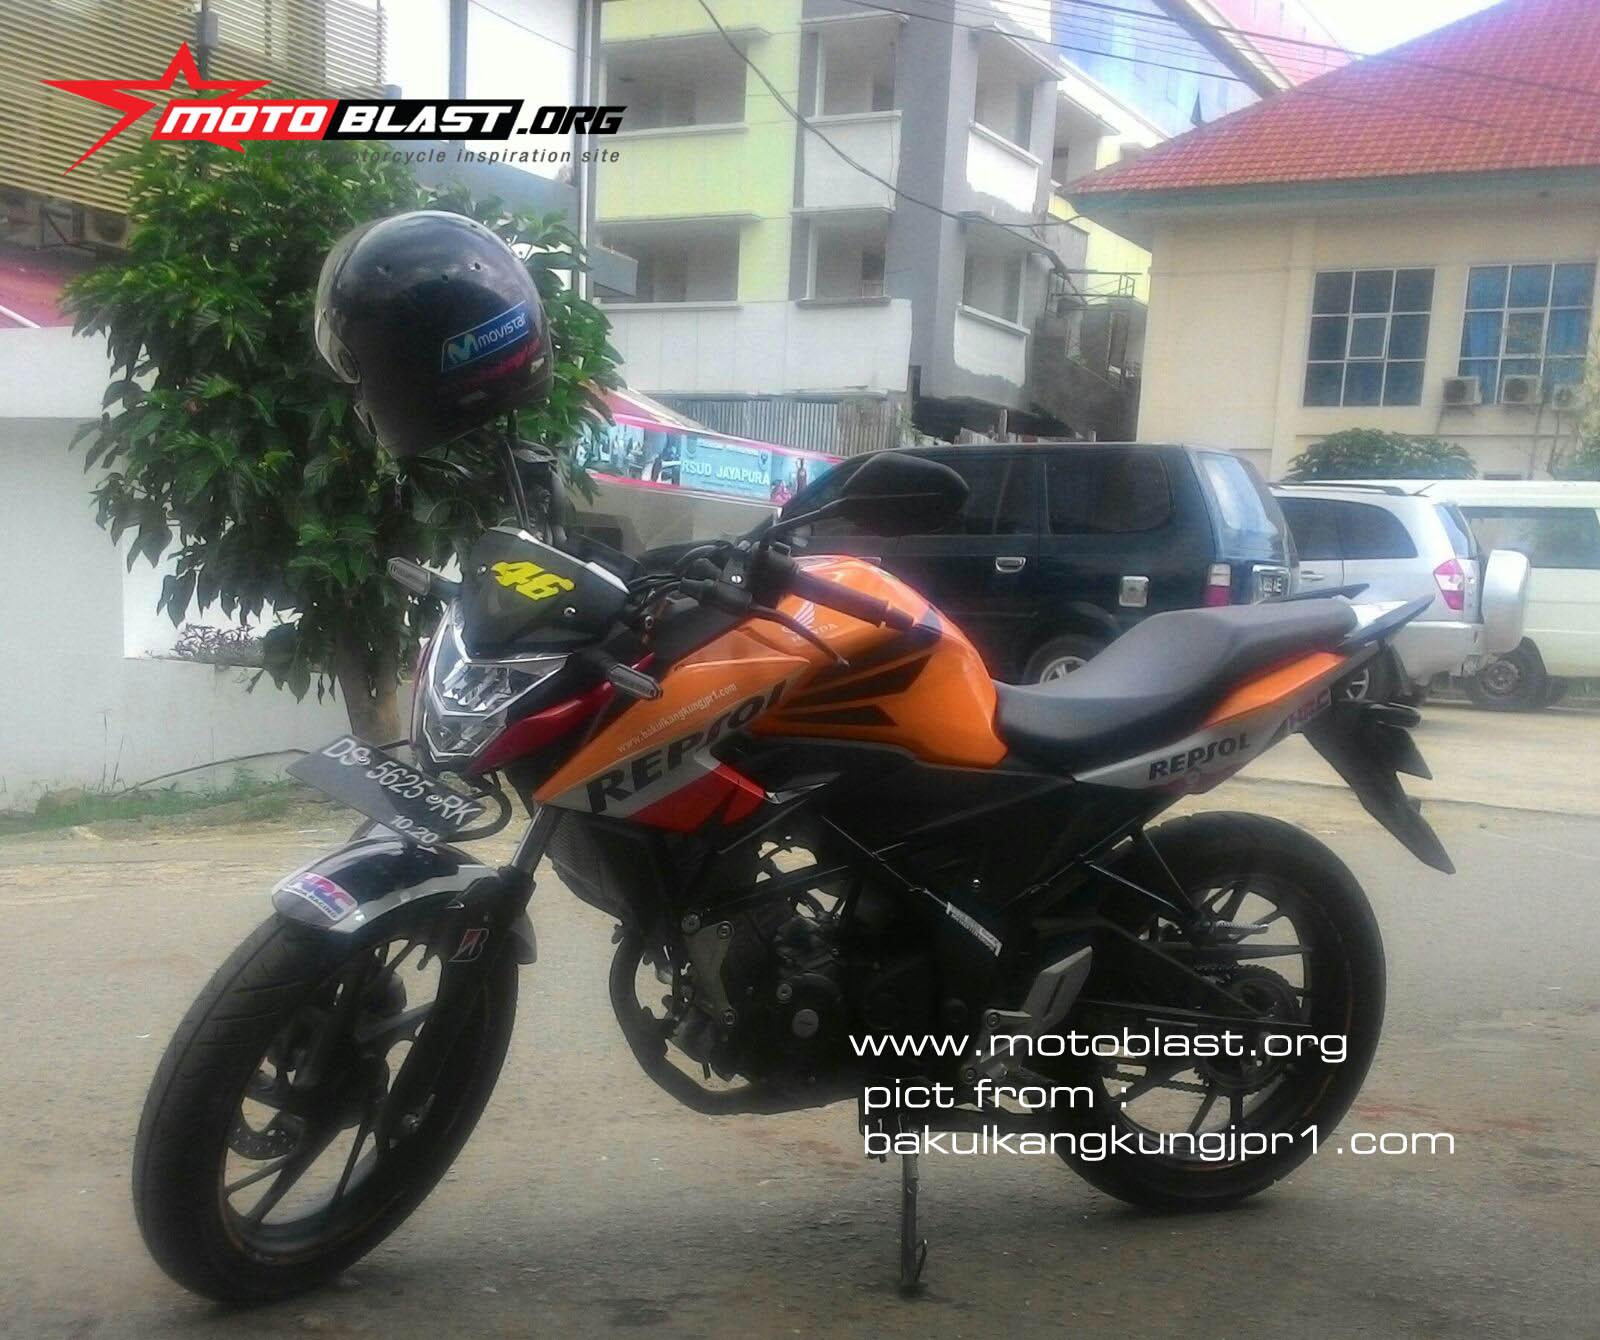 HOT All New CB150R Special Edition Livery Repsol Motogp Terjepret Di